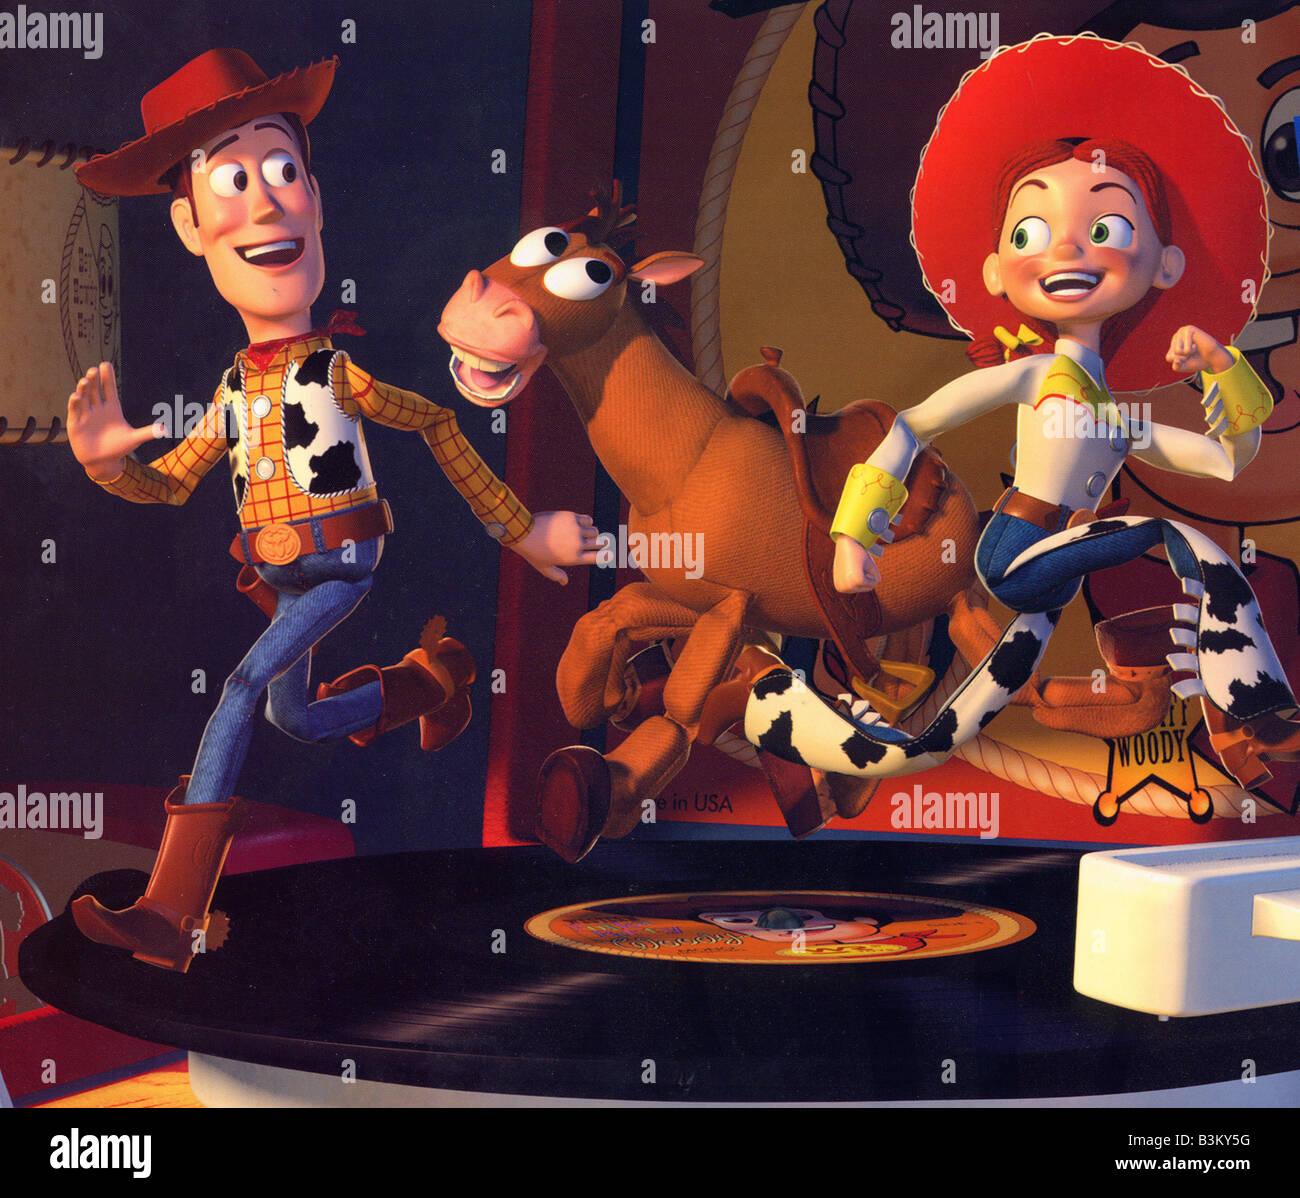 TOY STORY 2 - 1999 Buena Vista/Walt Disney film - Stock Image